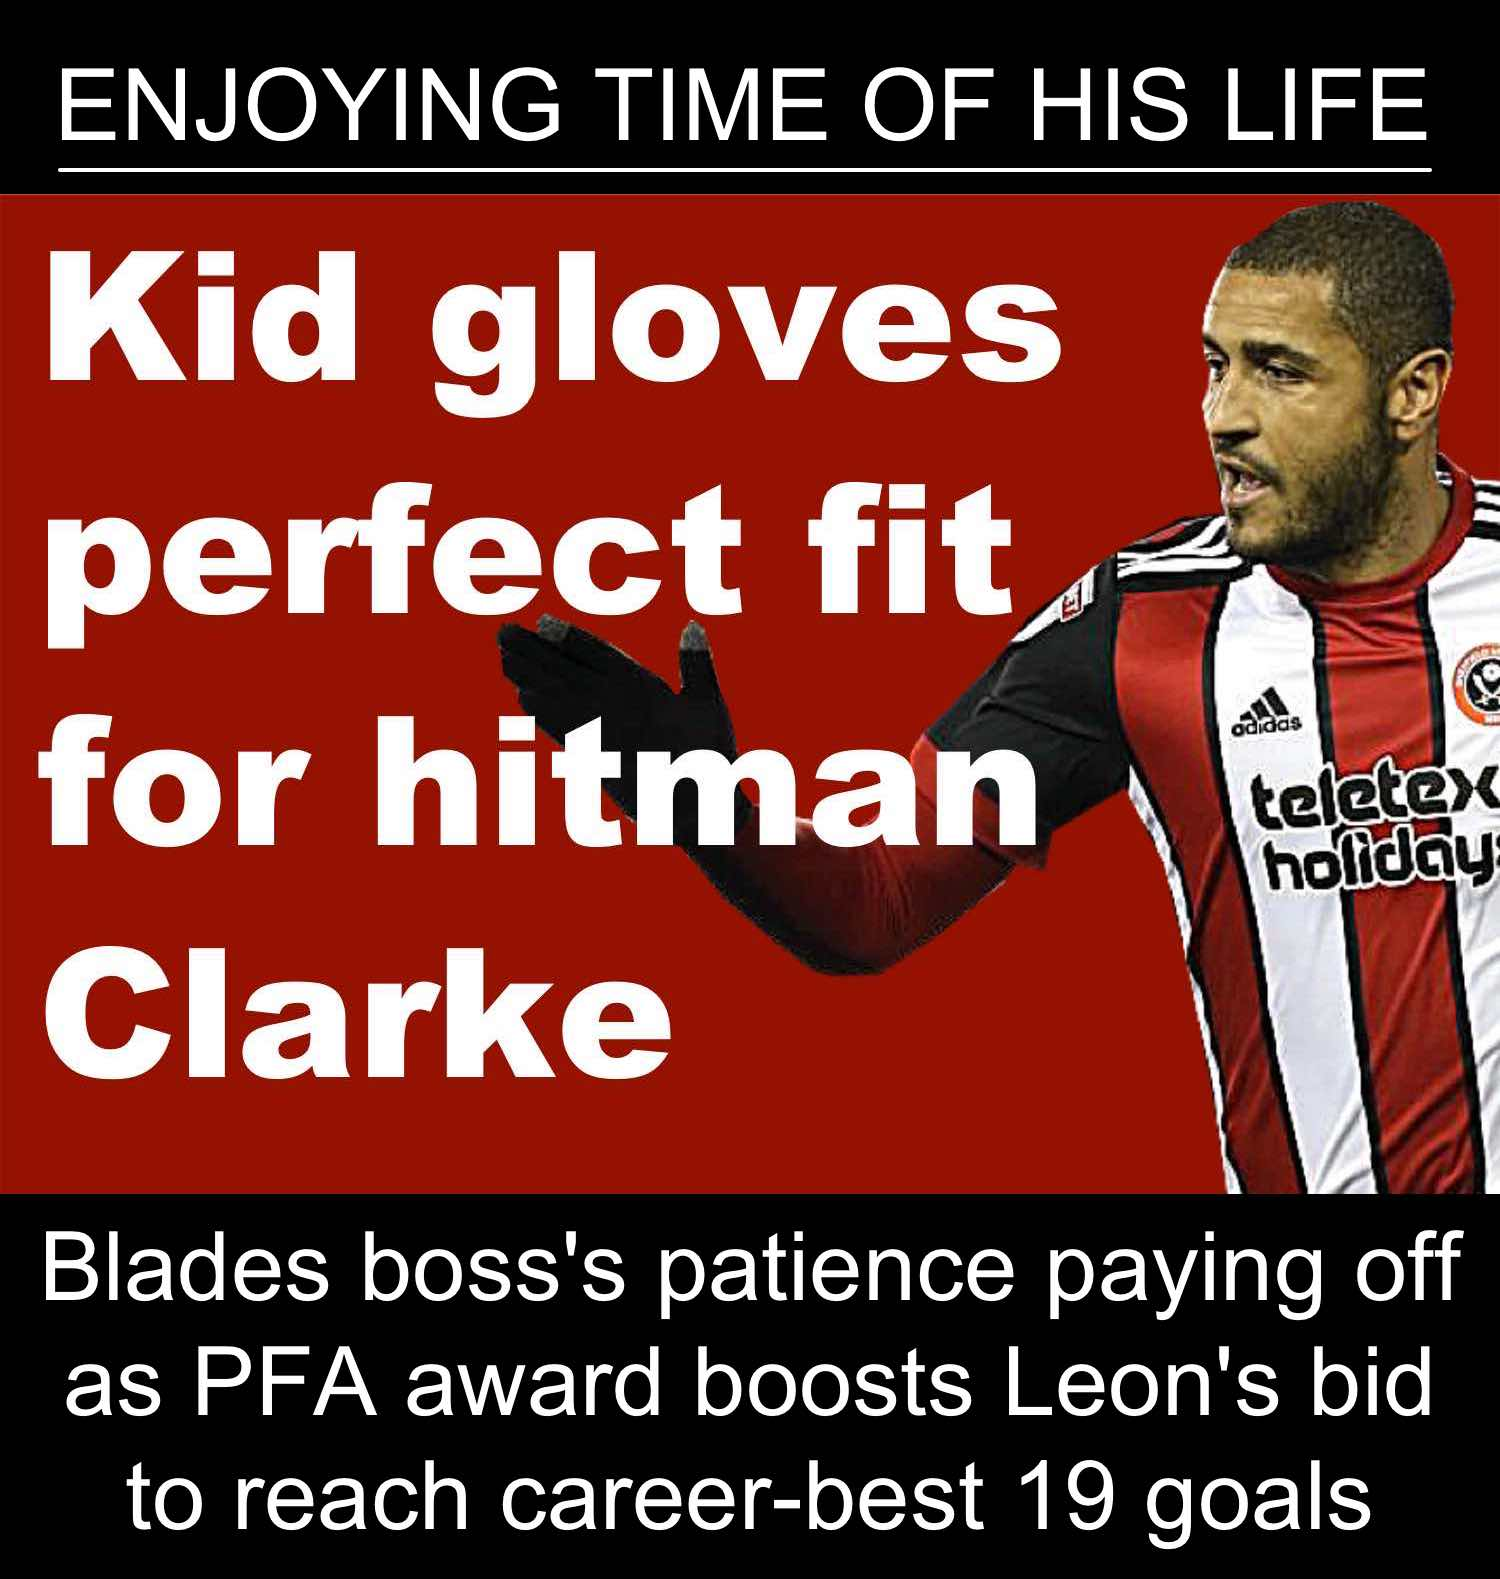 Sheffield United striker Leon Clarke finally responding to kid glove treatment at Bramall Lane as he wins PFA award